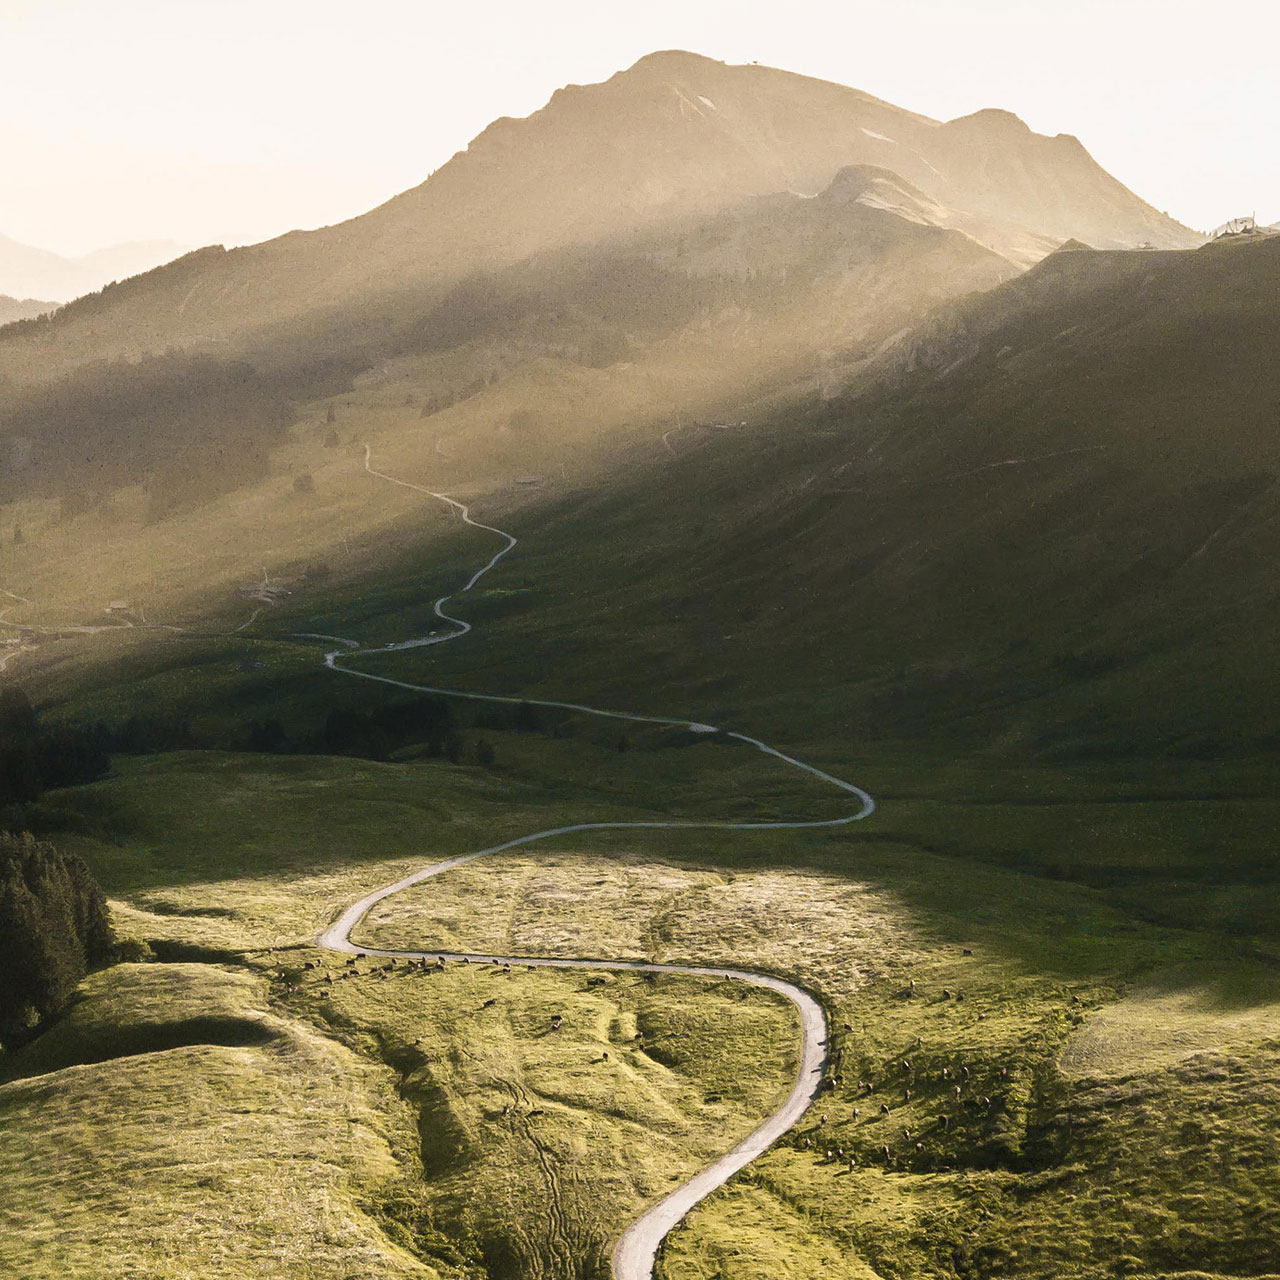 vallee-de-la-duche-c-hudry-le-grand-bornand-tourisme-bd-172059-web-223998-224666